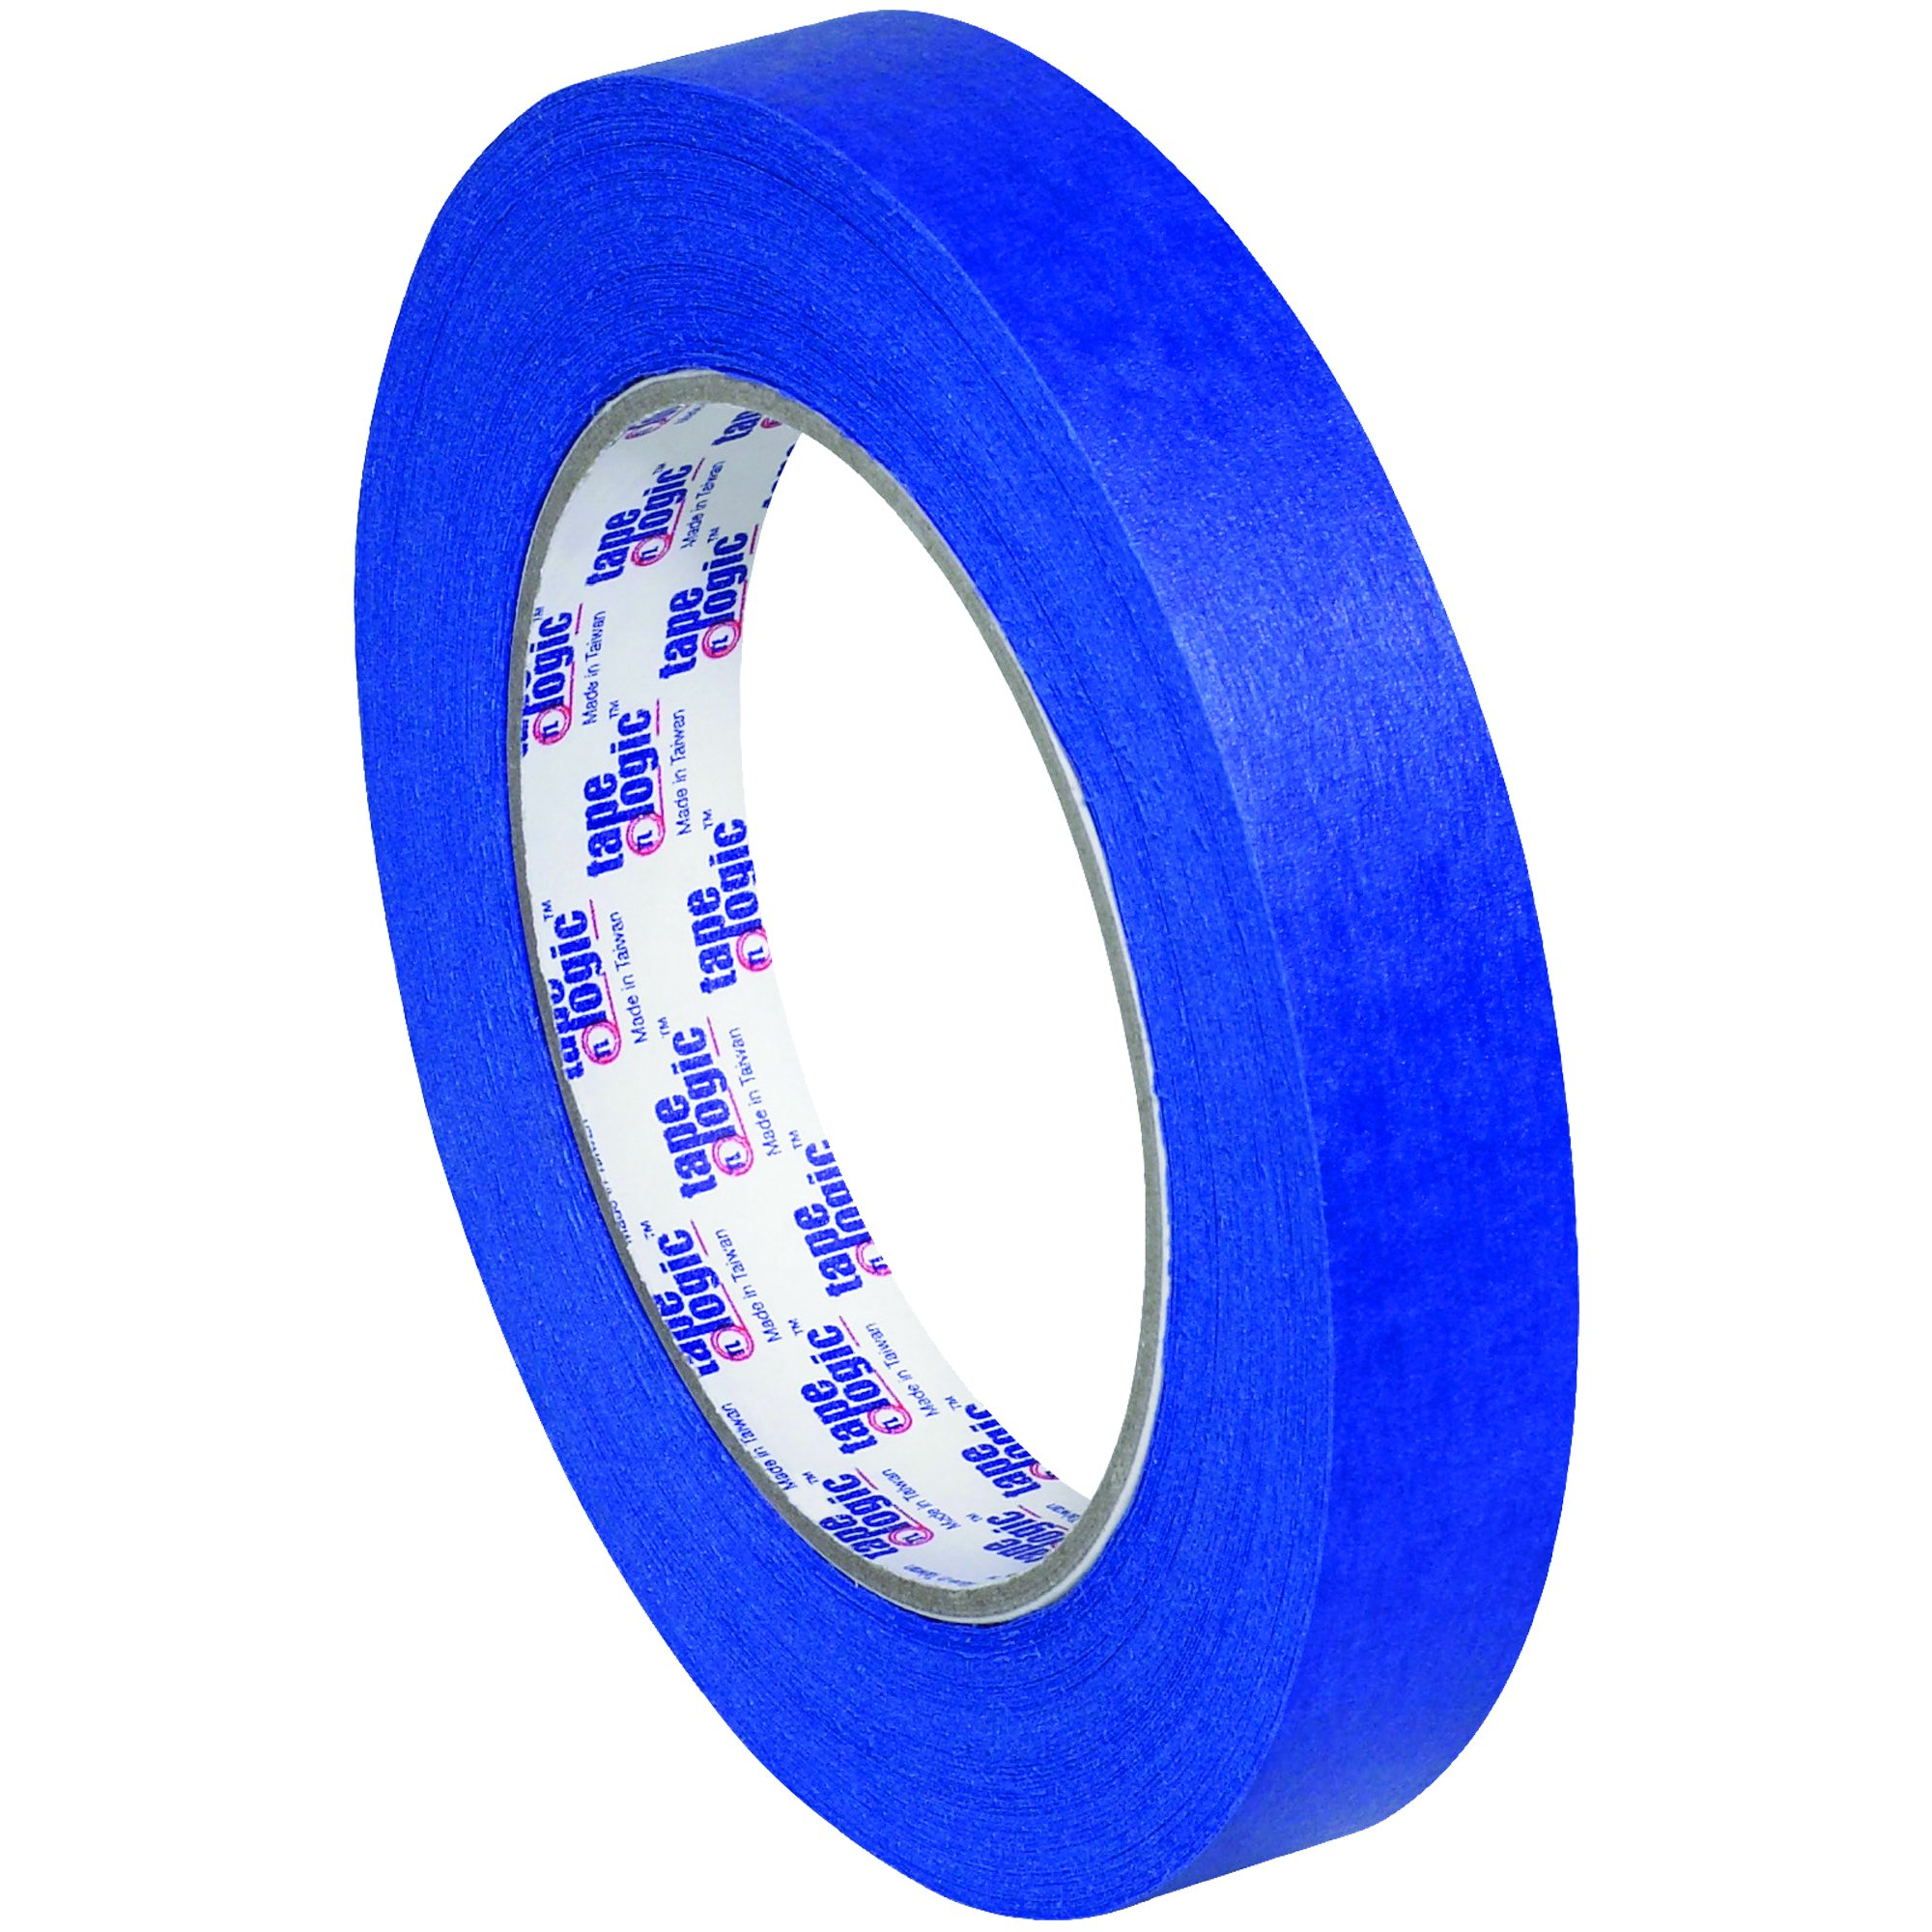 BOX USA BT9343000 Tape Logic 3000 Painter's Tape, 3/4'' x 60 yd., Blue (Pack of 48)